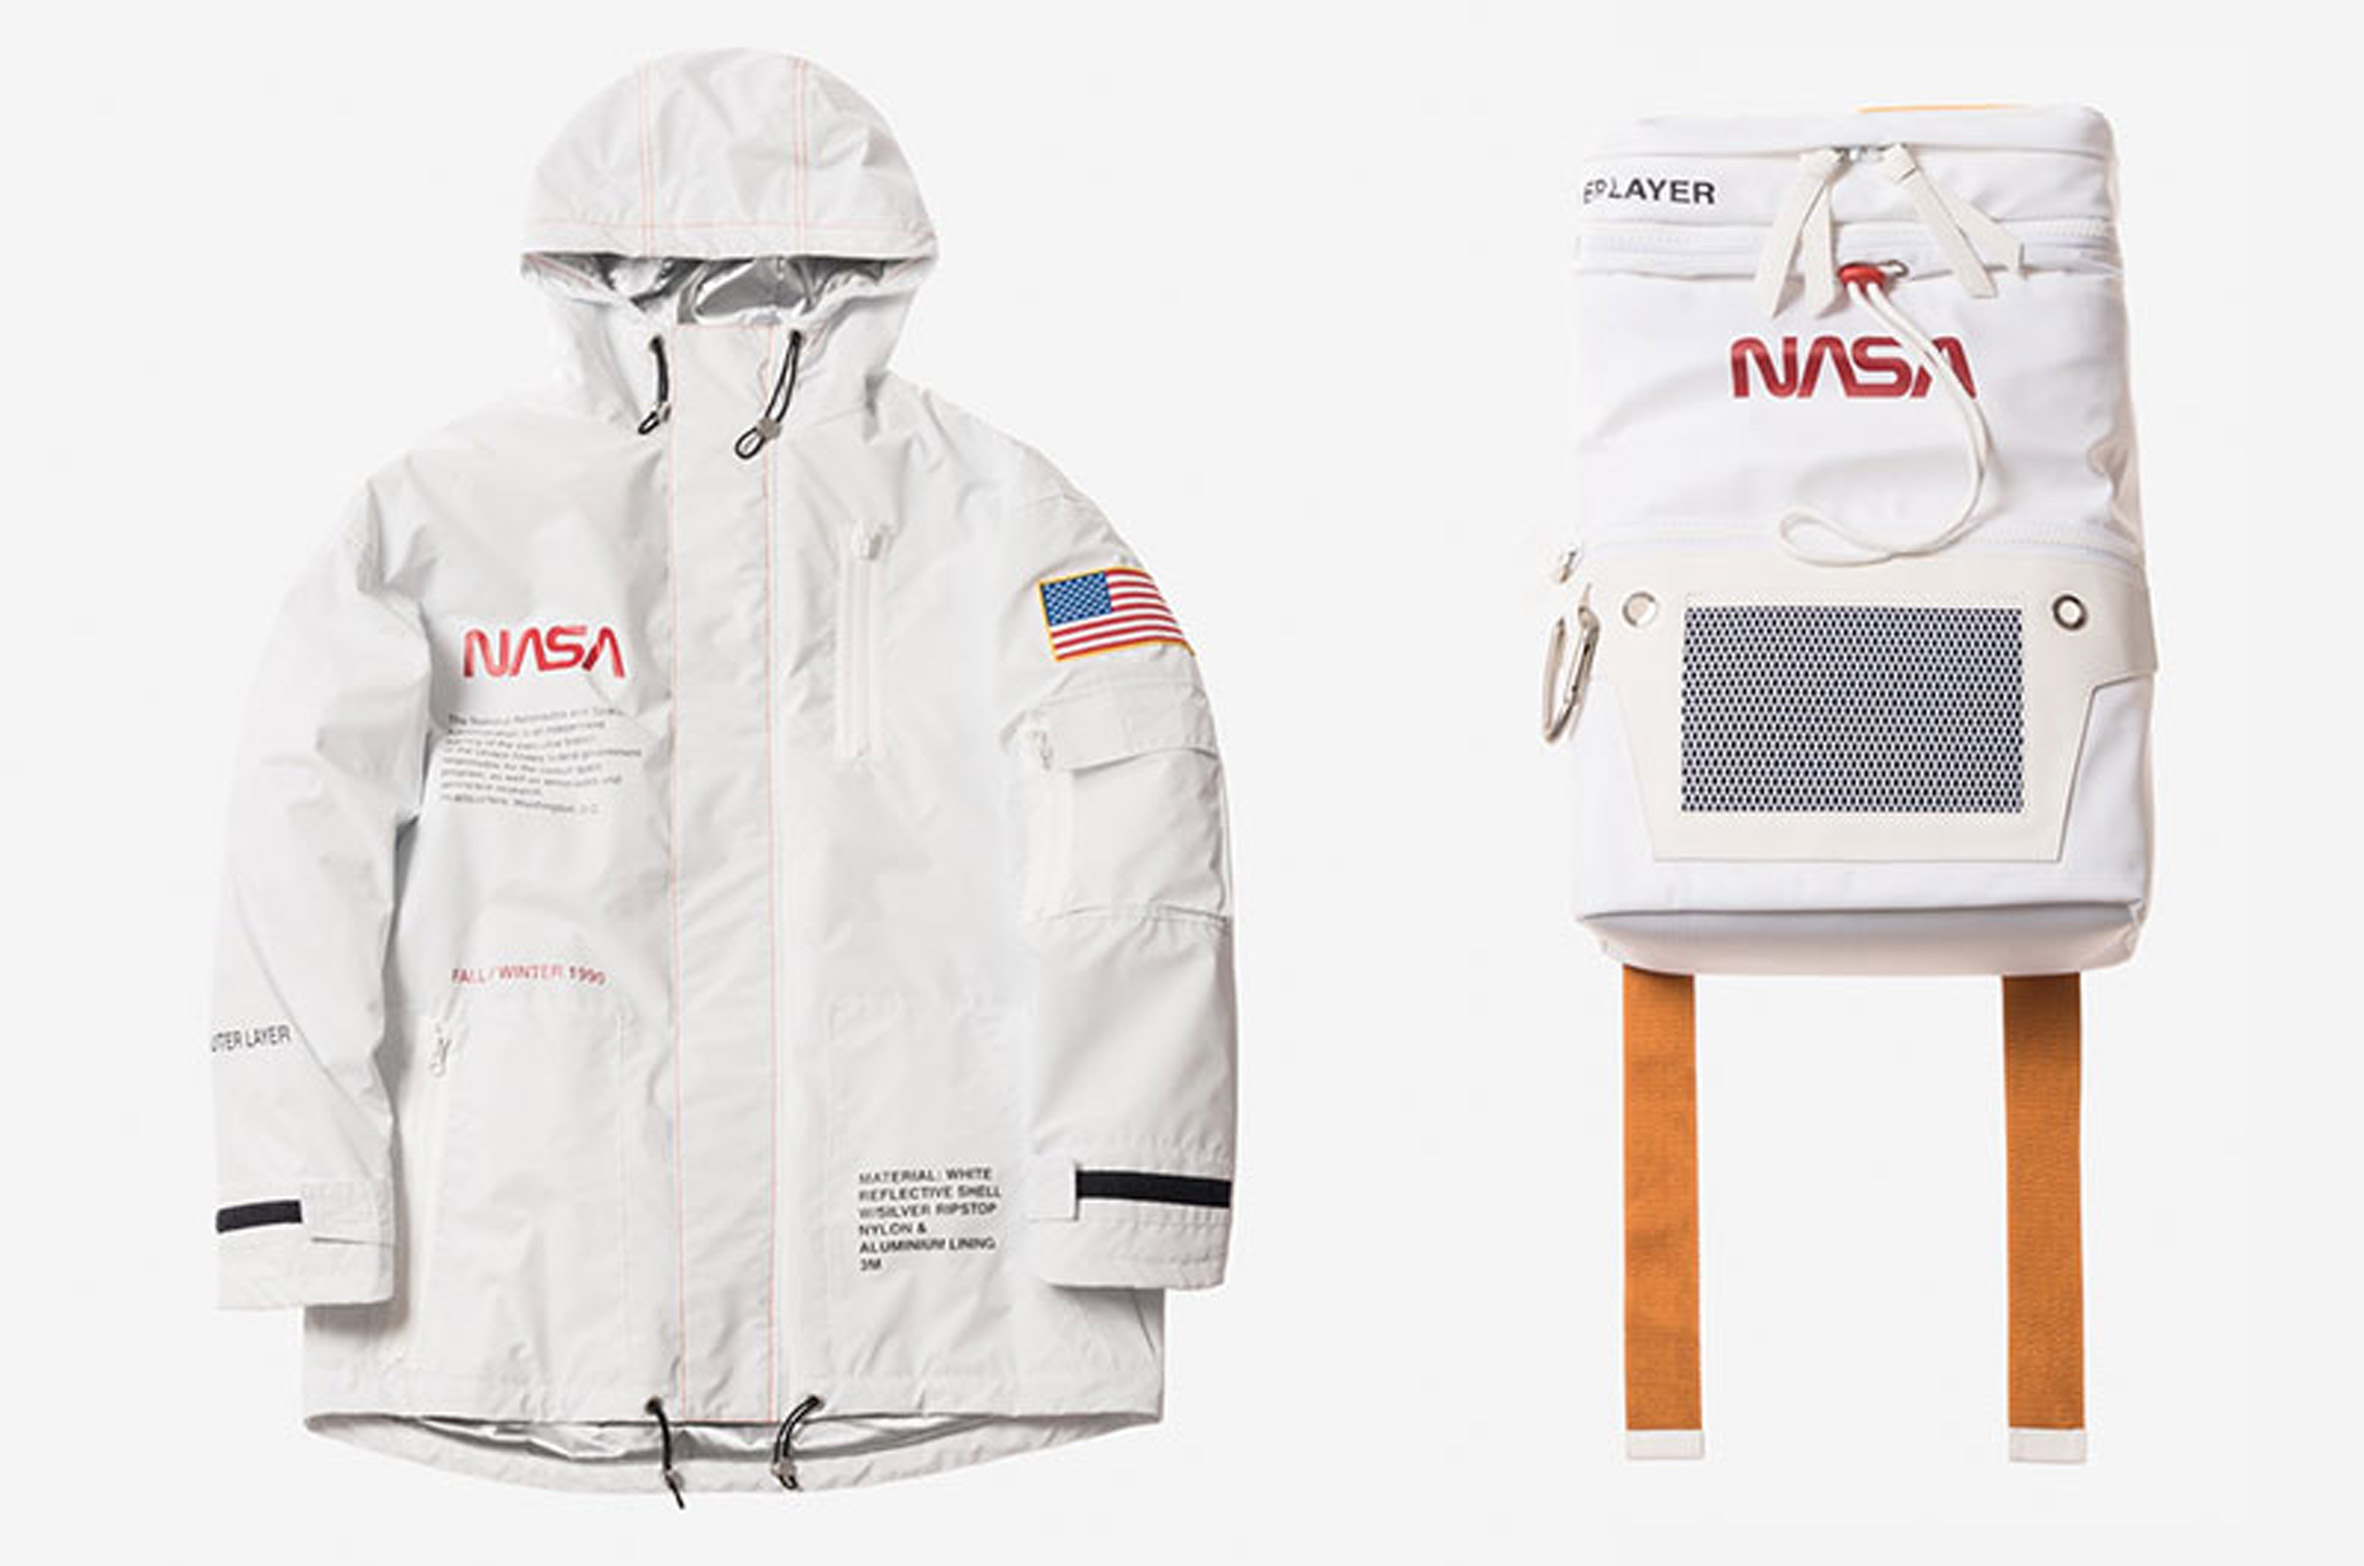 heron-preston-nasa-anniversary-clothing-range-fashion_dezeen_2364_col_1.jpg